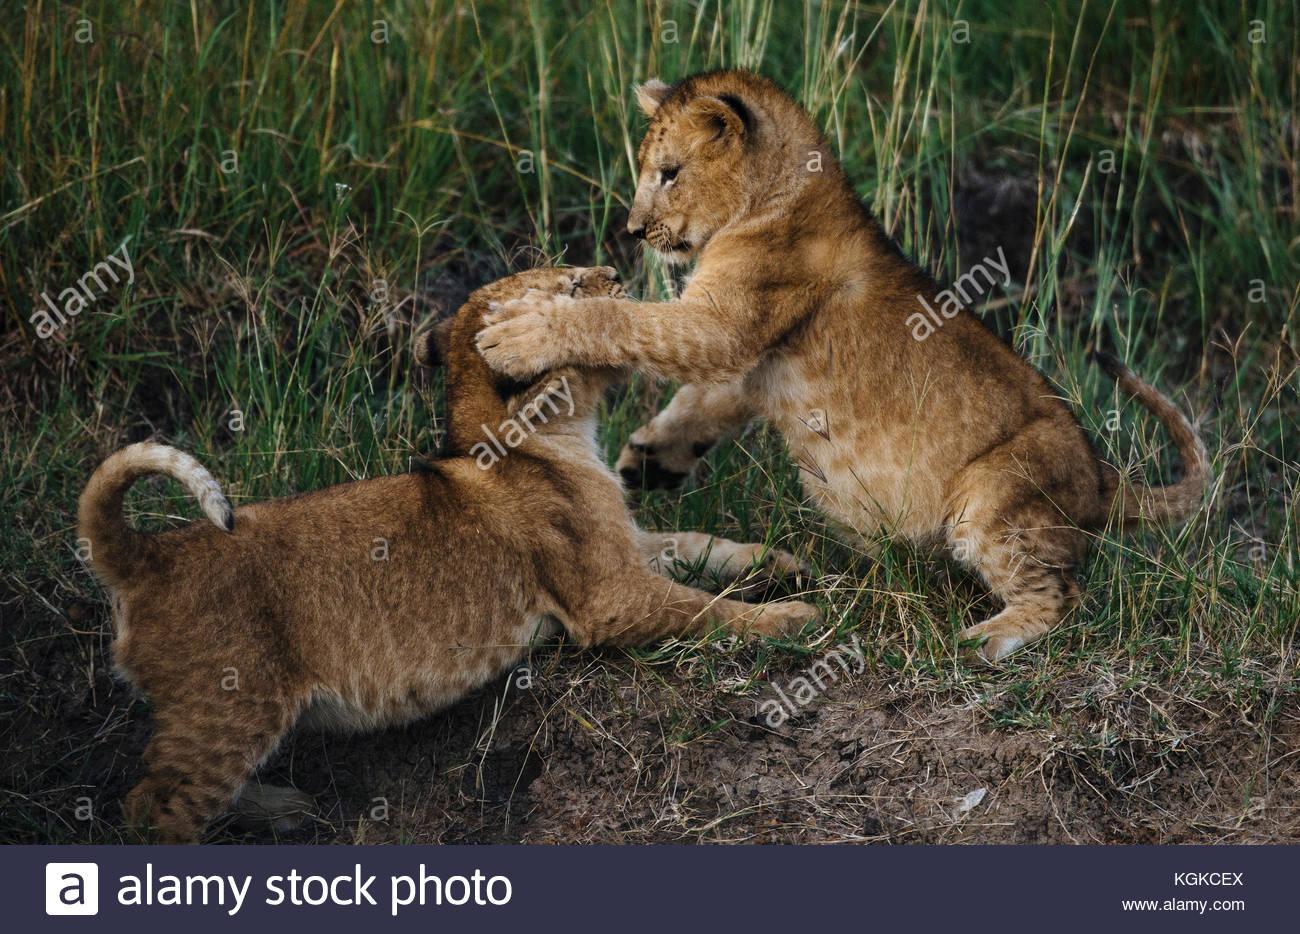 Lion cubs playing, Panthera leo, in Masai Mara National Reserve. - Stock Image